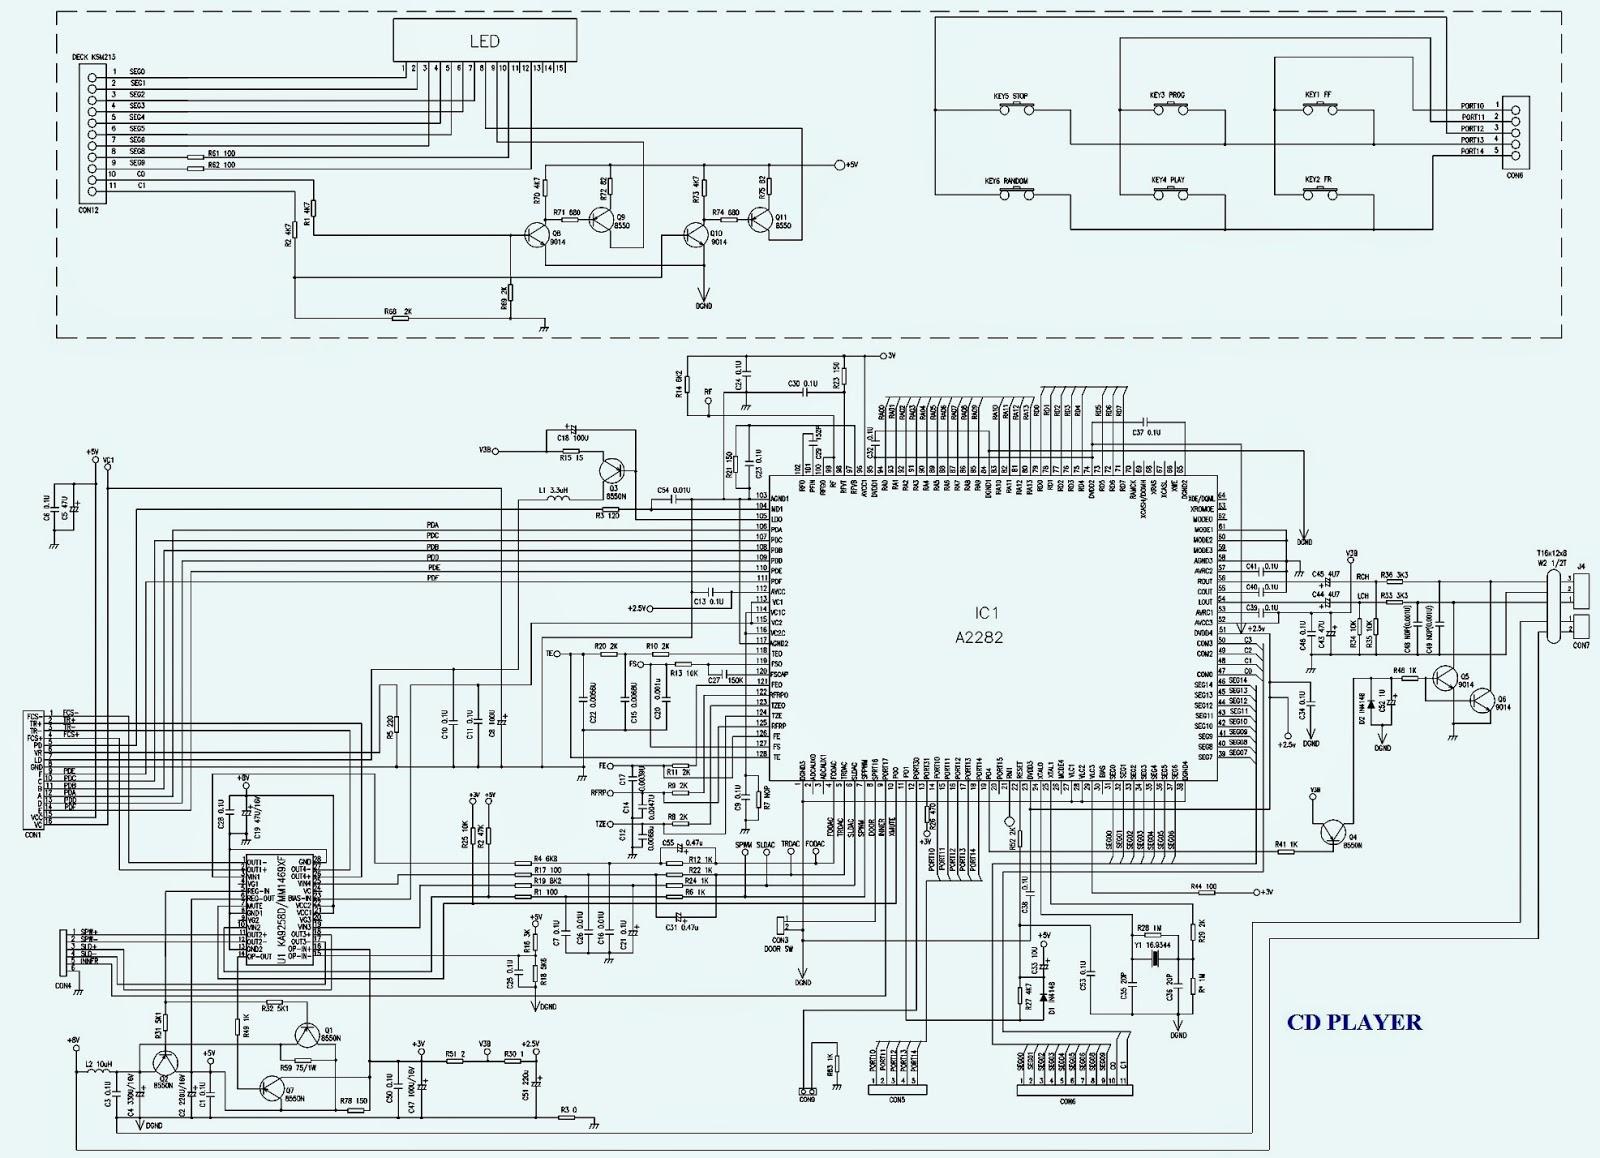 cd player schematic bookmark about wiring diagram Refrigerator Wiring Diagram